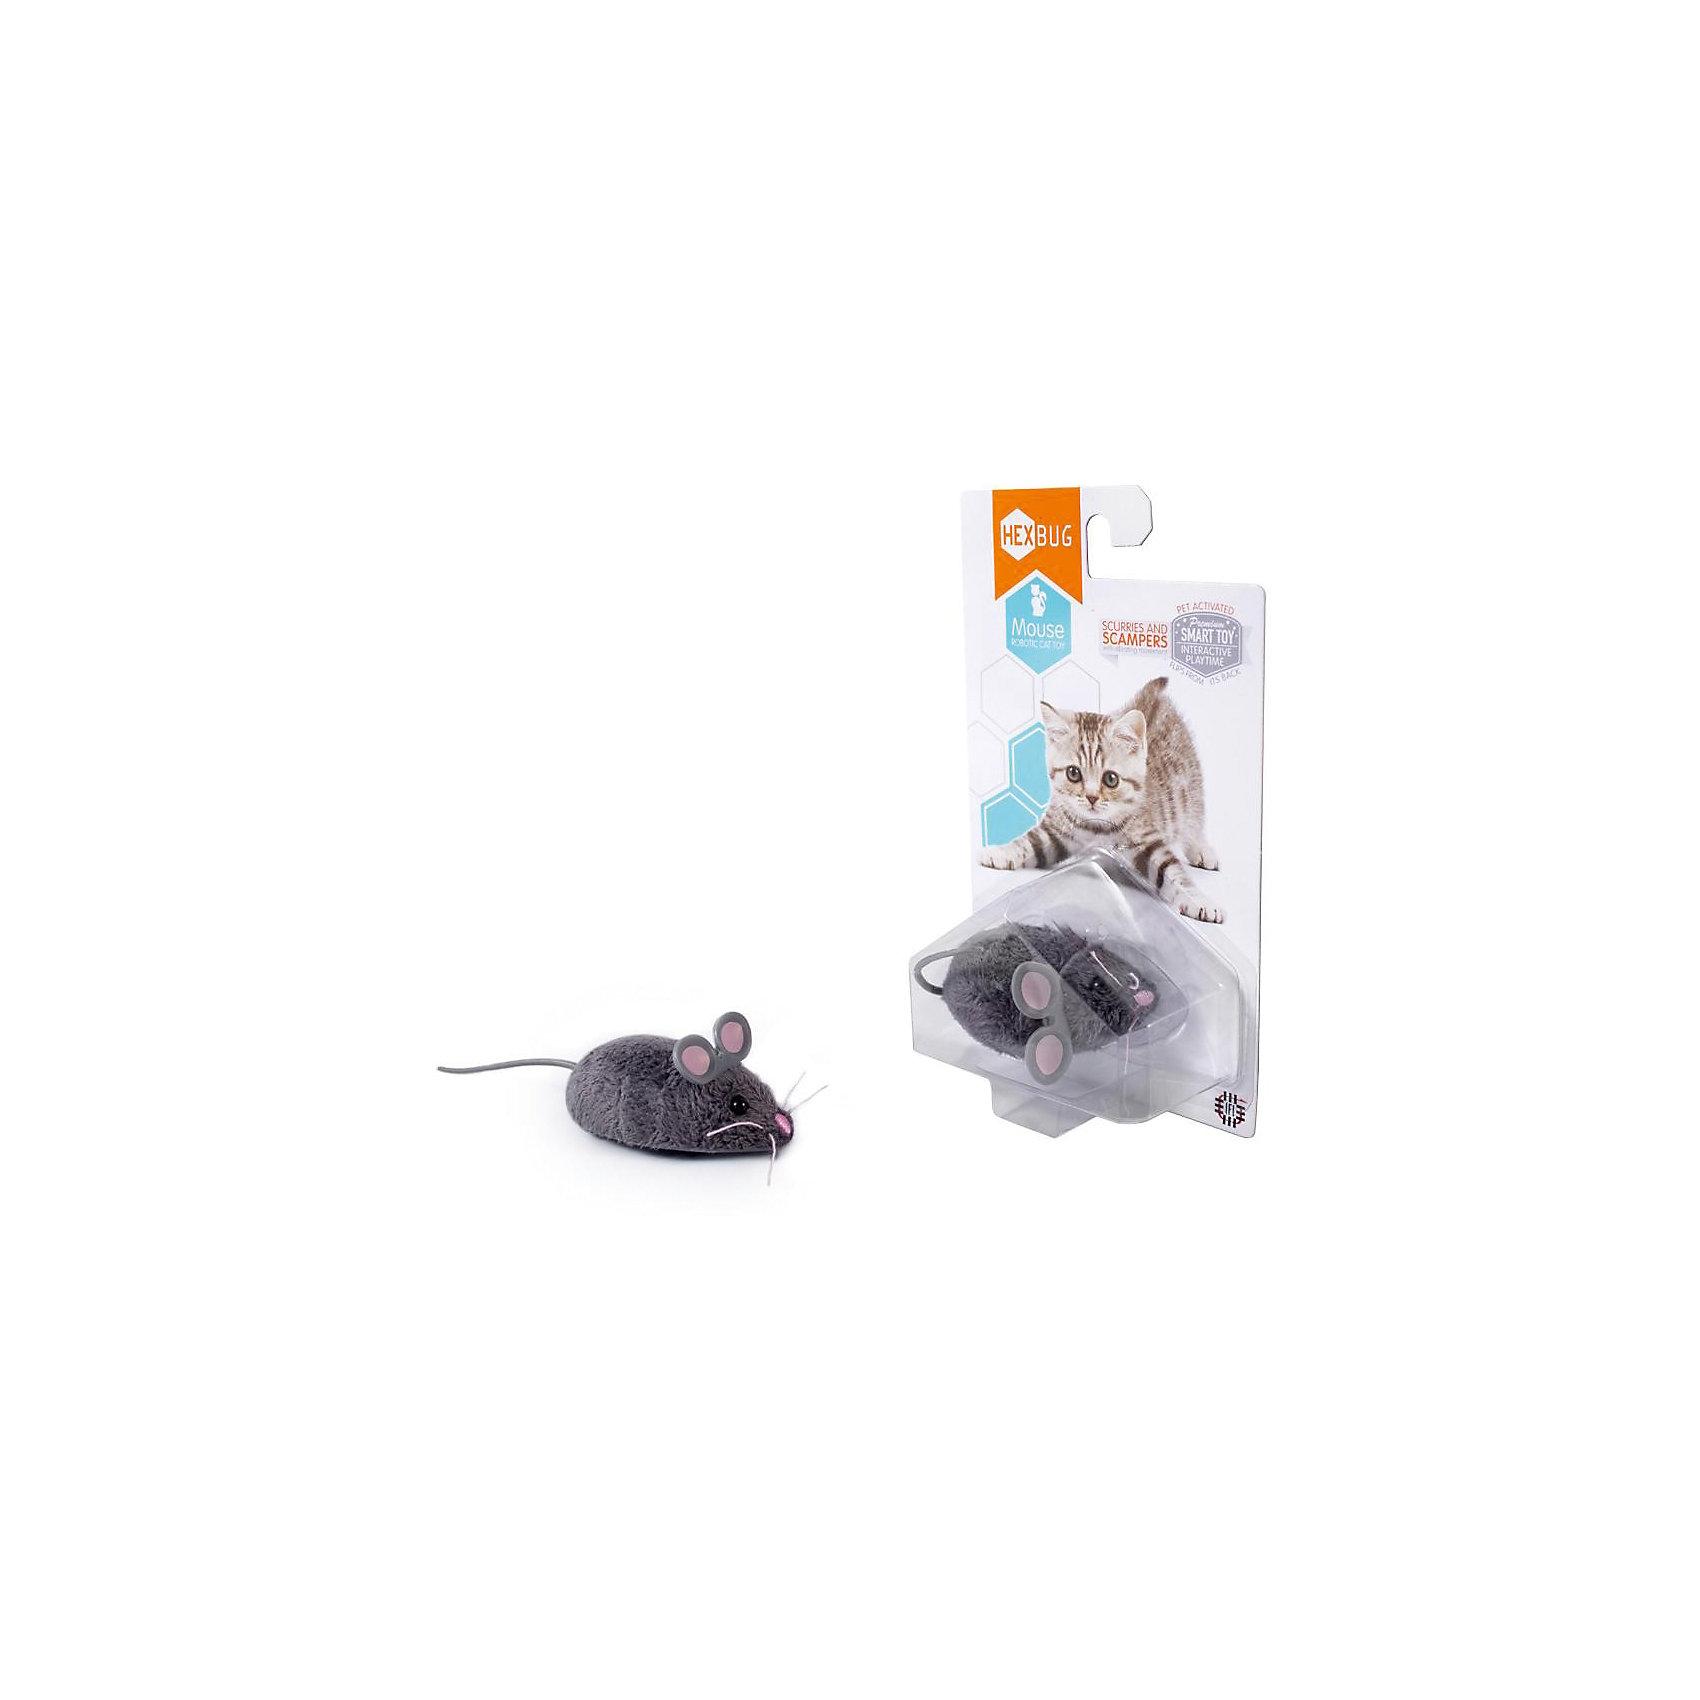 Микро-робот Mouse Cat Toy, Hexbug<br><br>Ширина мм: 160<br>Глубина мм: 40<br>Высота мм: 100<br>Вес г: 37<br>Возраст от месяцев: 36<br>Возраст до месяцев: 2147483647<br>Пол: Унисекс<br>Возраст: Детский<br>SKU: 5507200